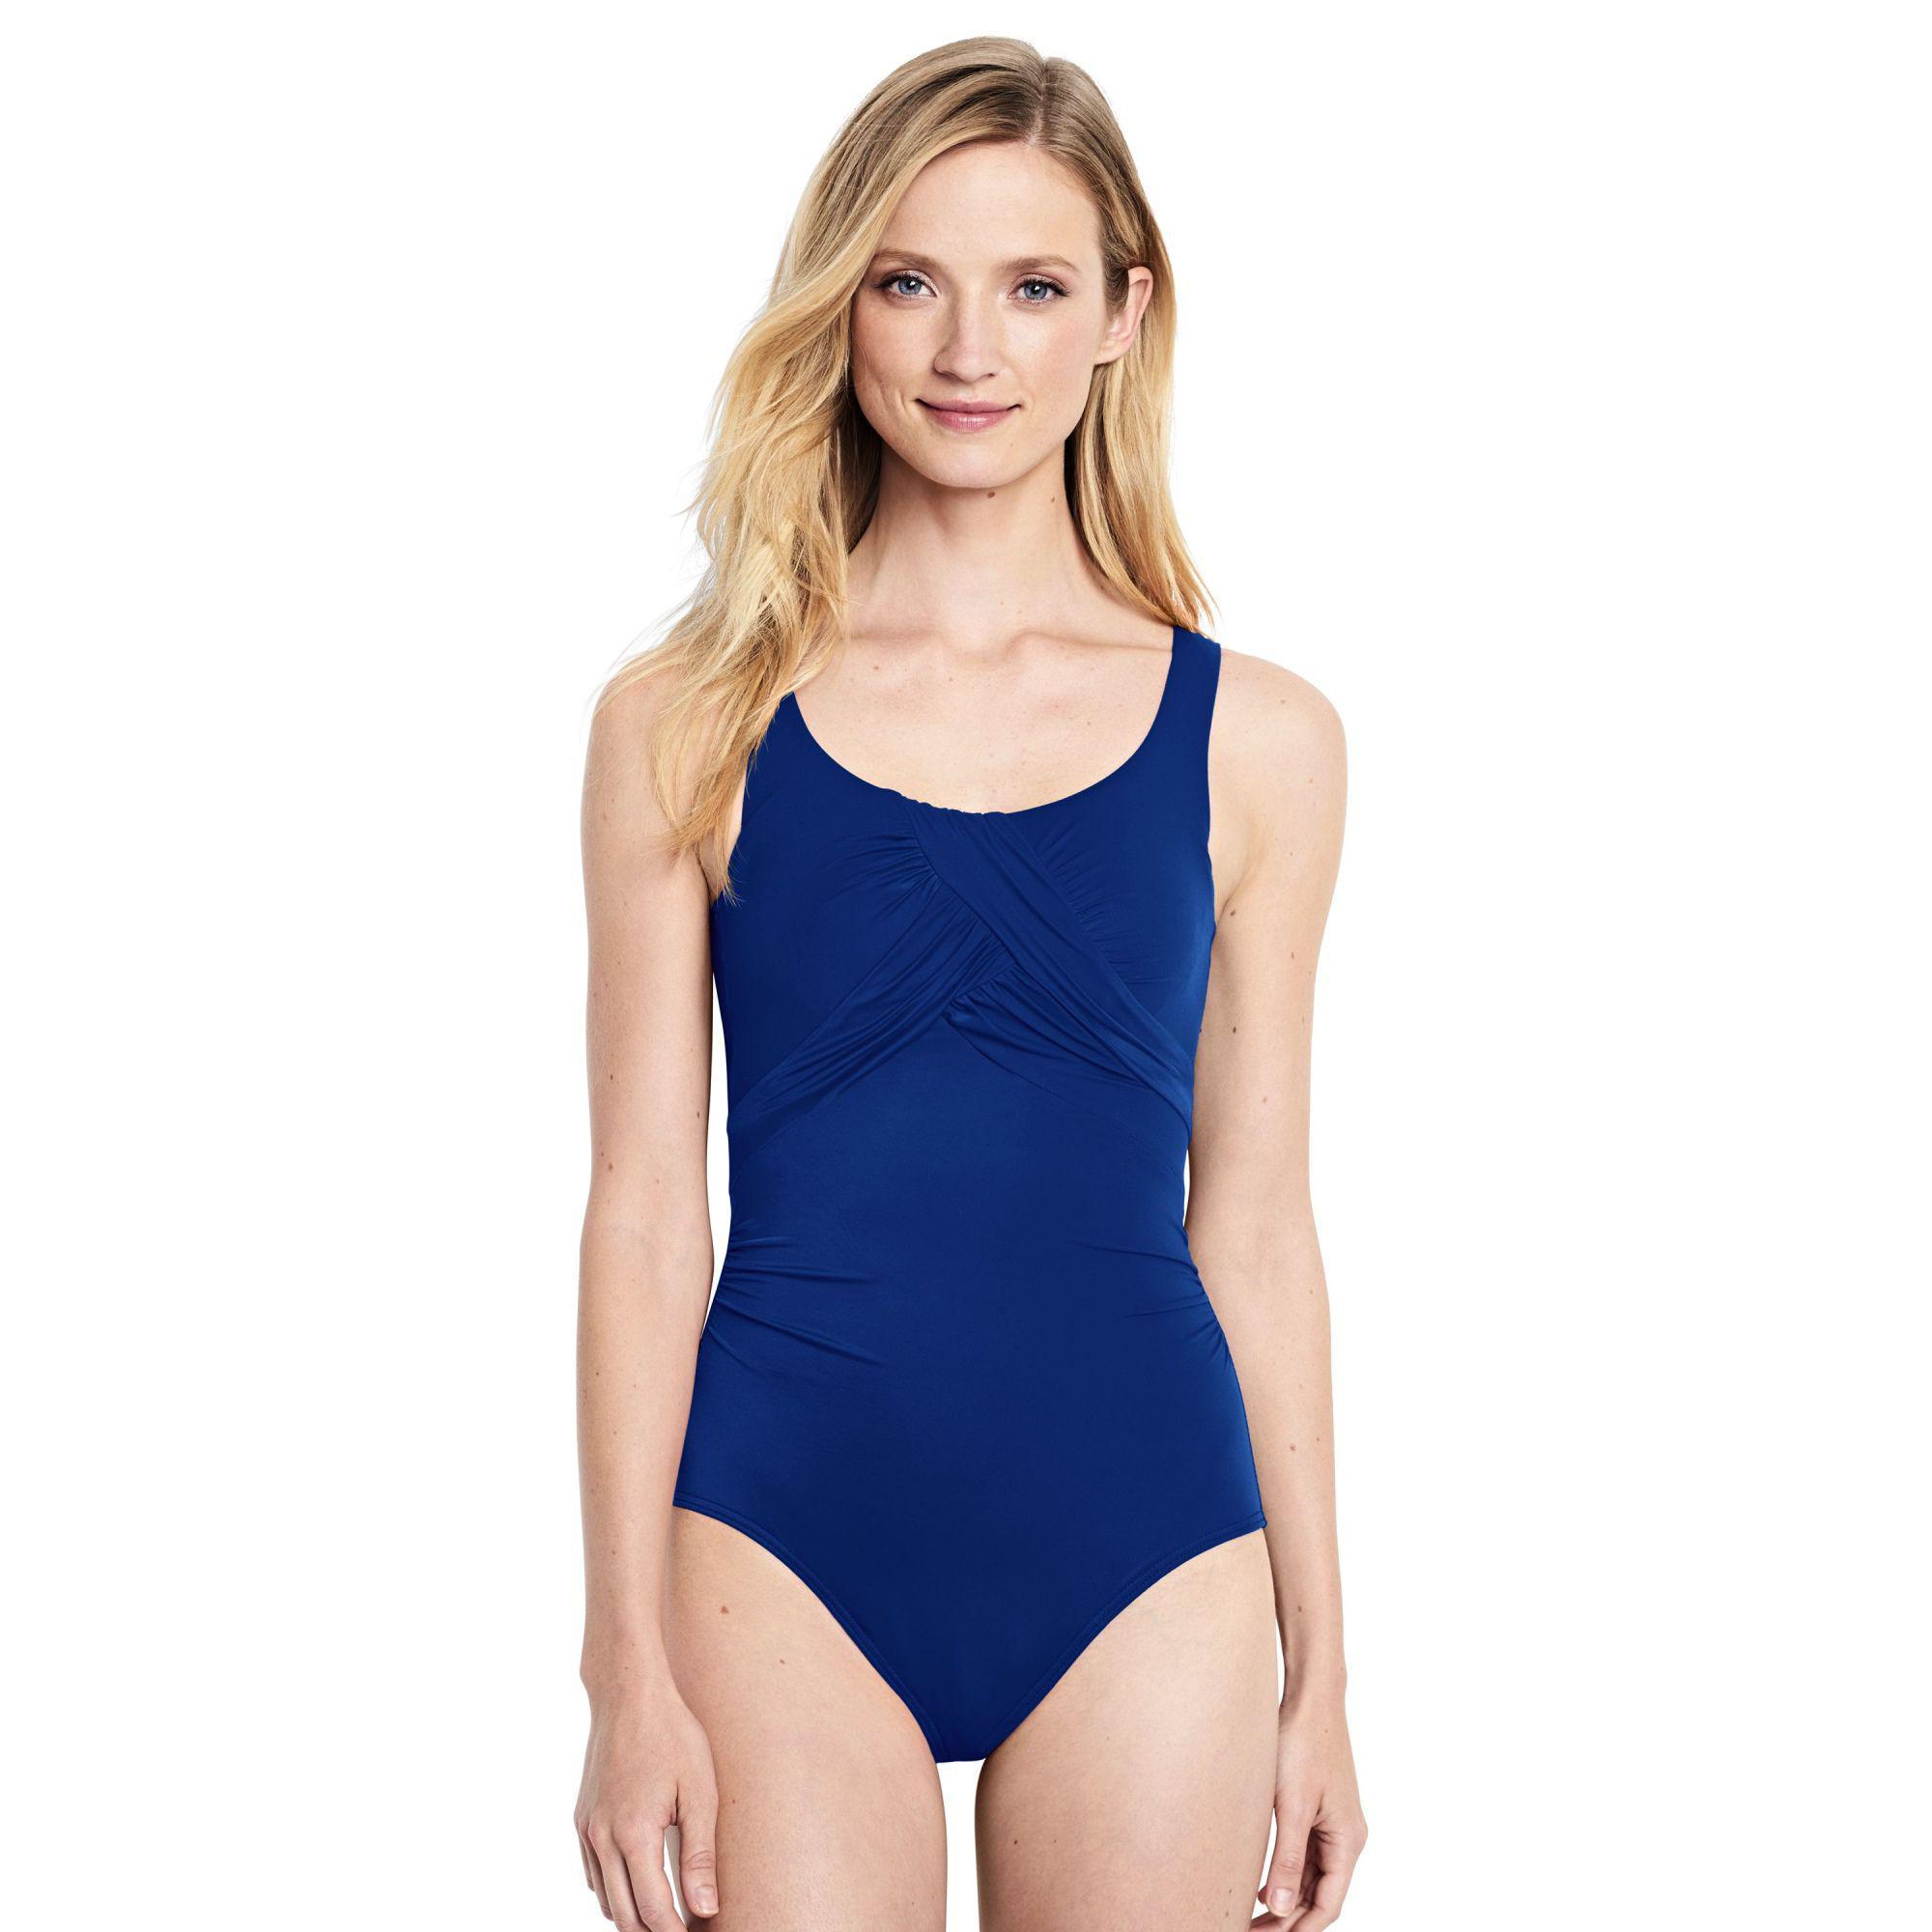 7b0f86c9a8b Lands' End Blue D-cup Carmela Slender Swimsuit in Blue - Lyst